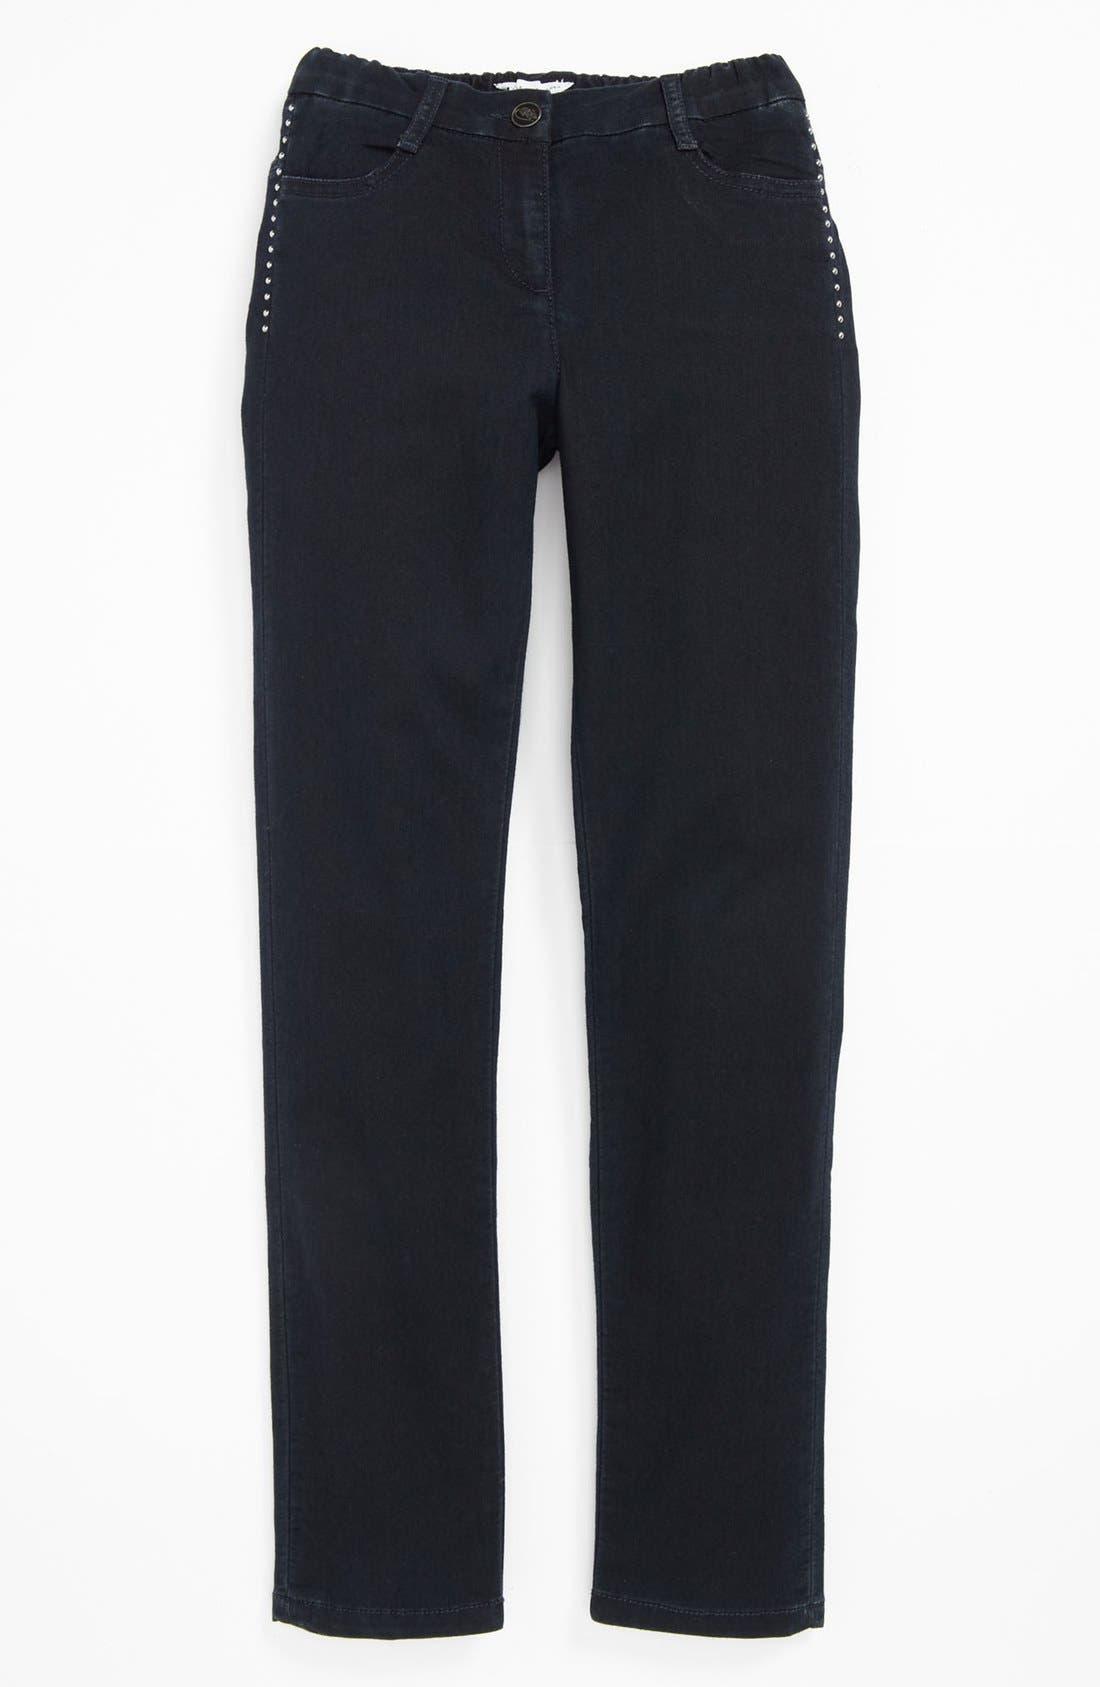 Main Image - LITTLE MARC JACOBS Denim Trousers (Little Girls & Big Girls)